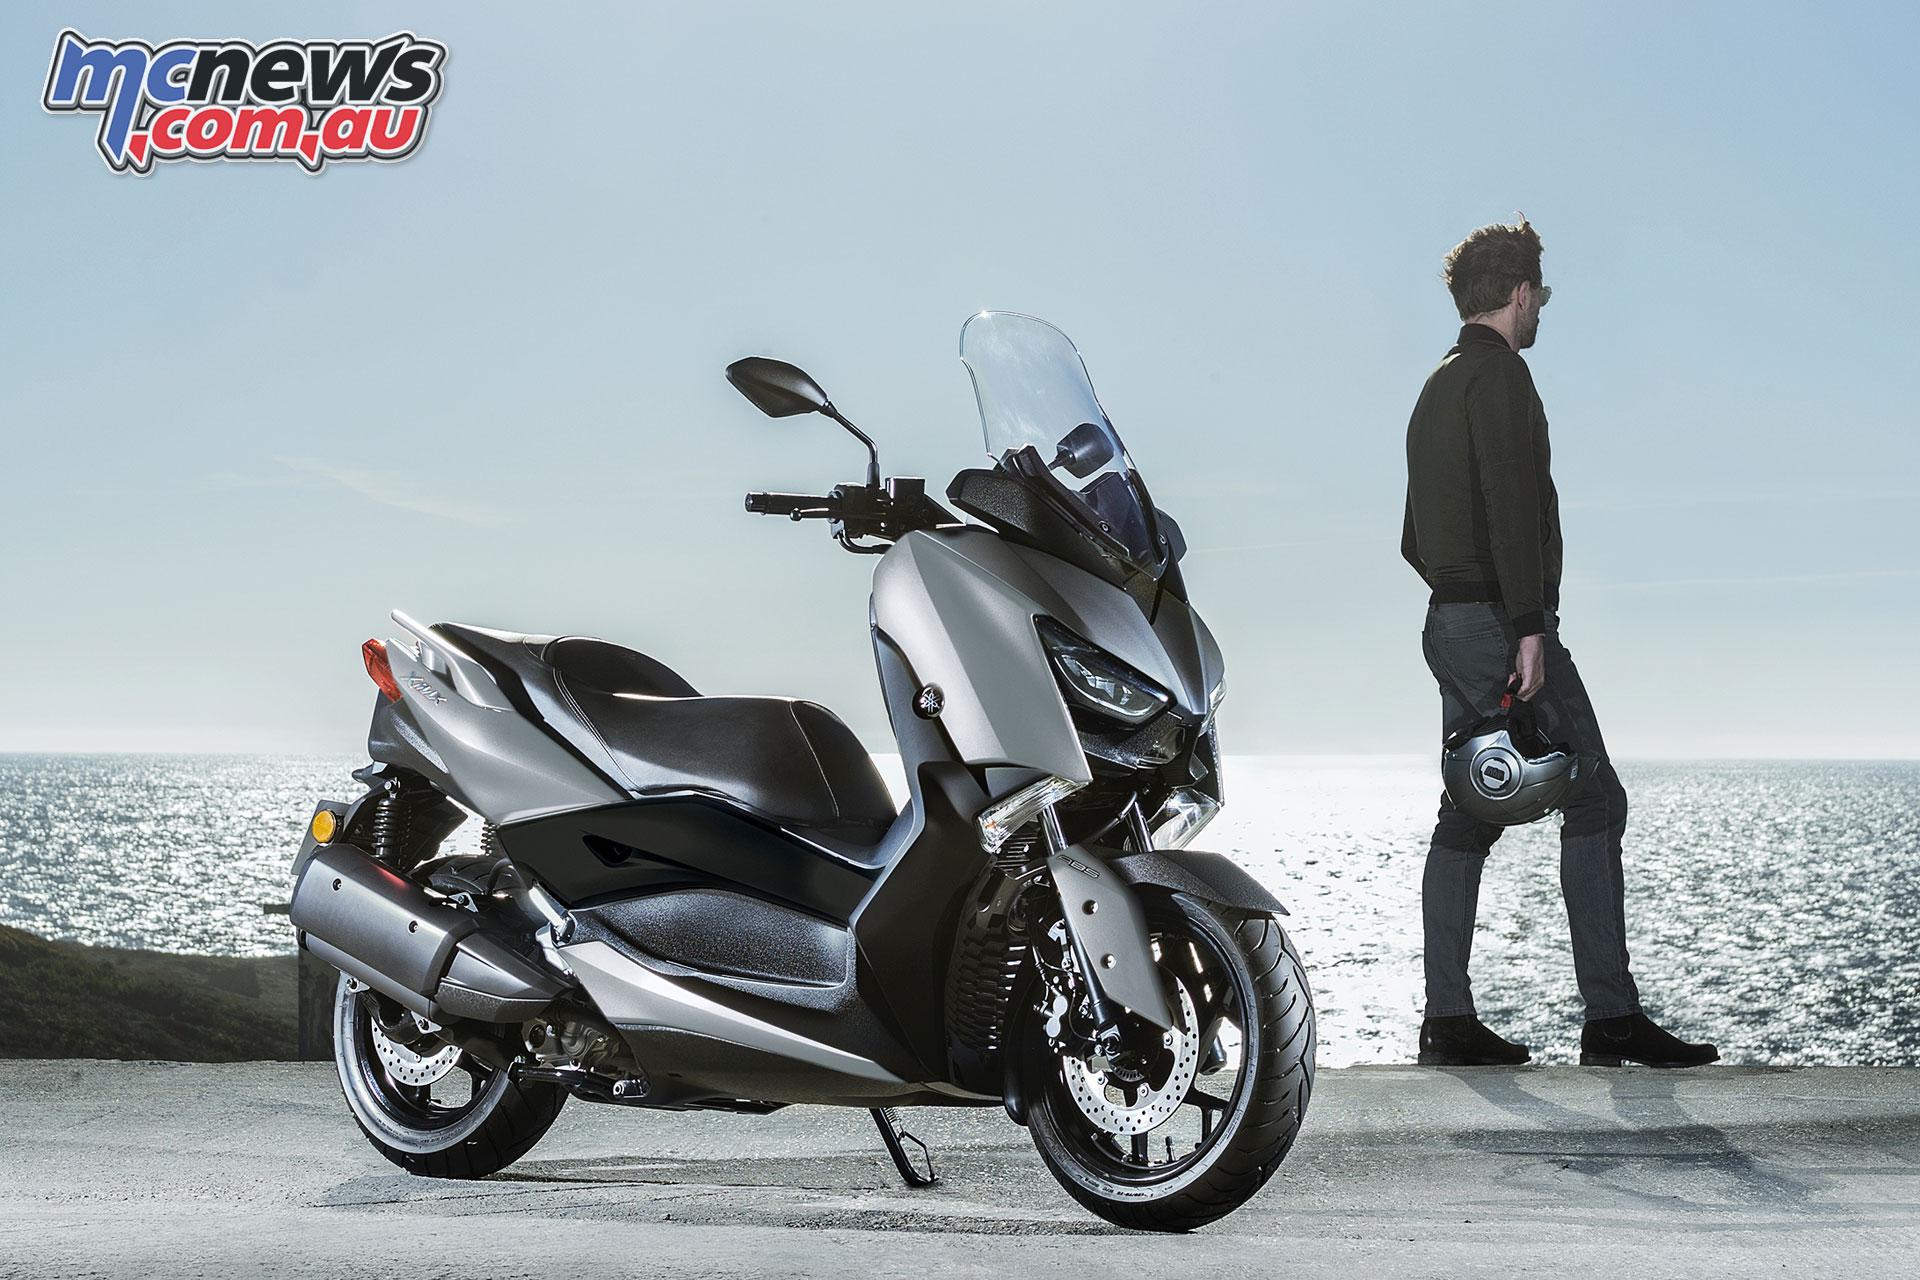 2019 Yamaha Xmax 300 Arrives 6999 Rrp Mcnews Com Au